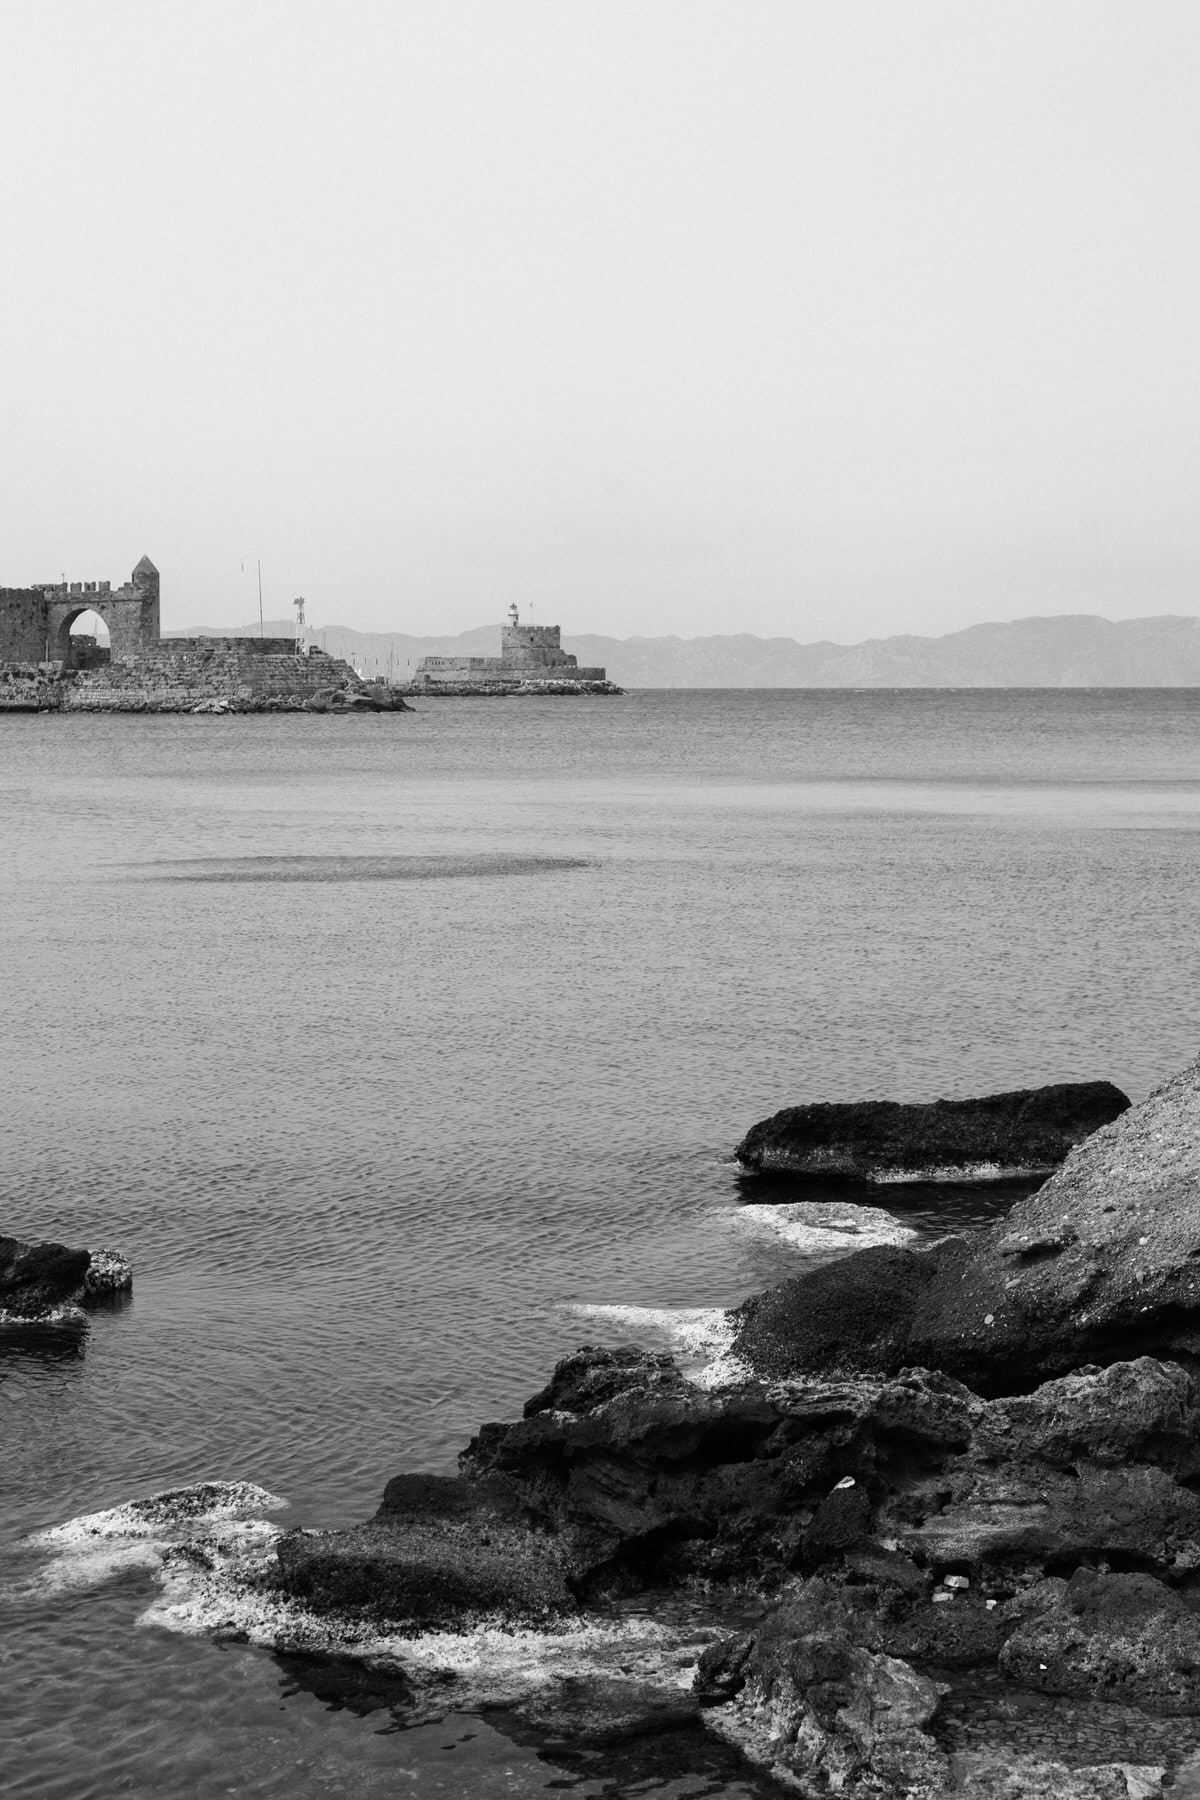 Rhodes-Greece-Island-black-and-white-fine-art-photography-by-Studio-L-photographer-Laura-Schneider-_2581